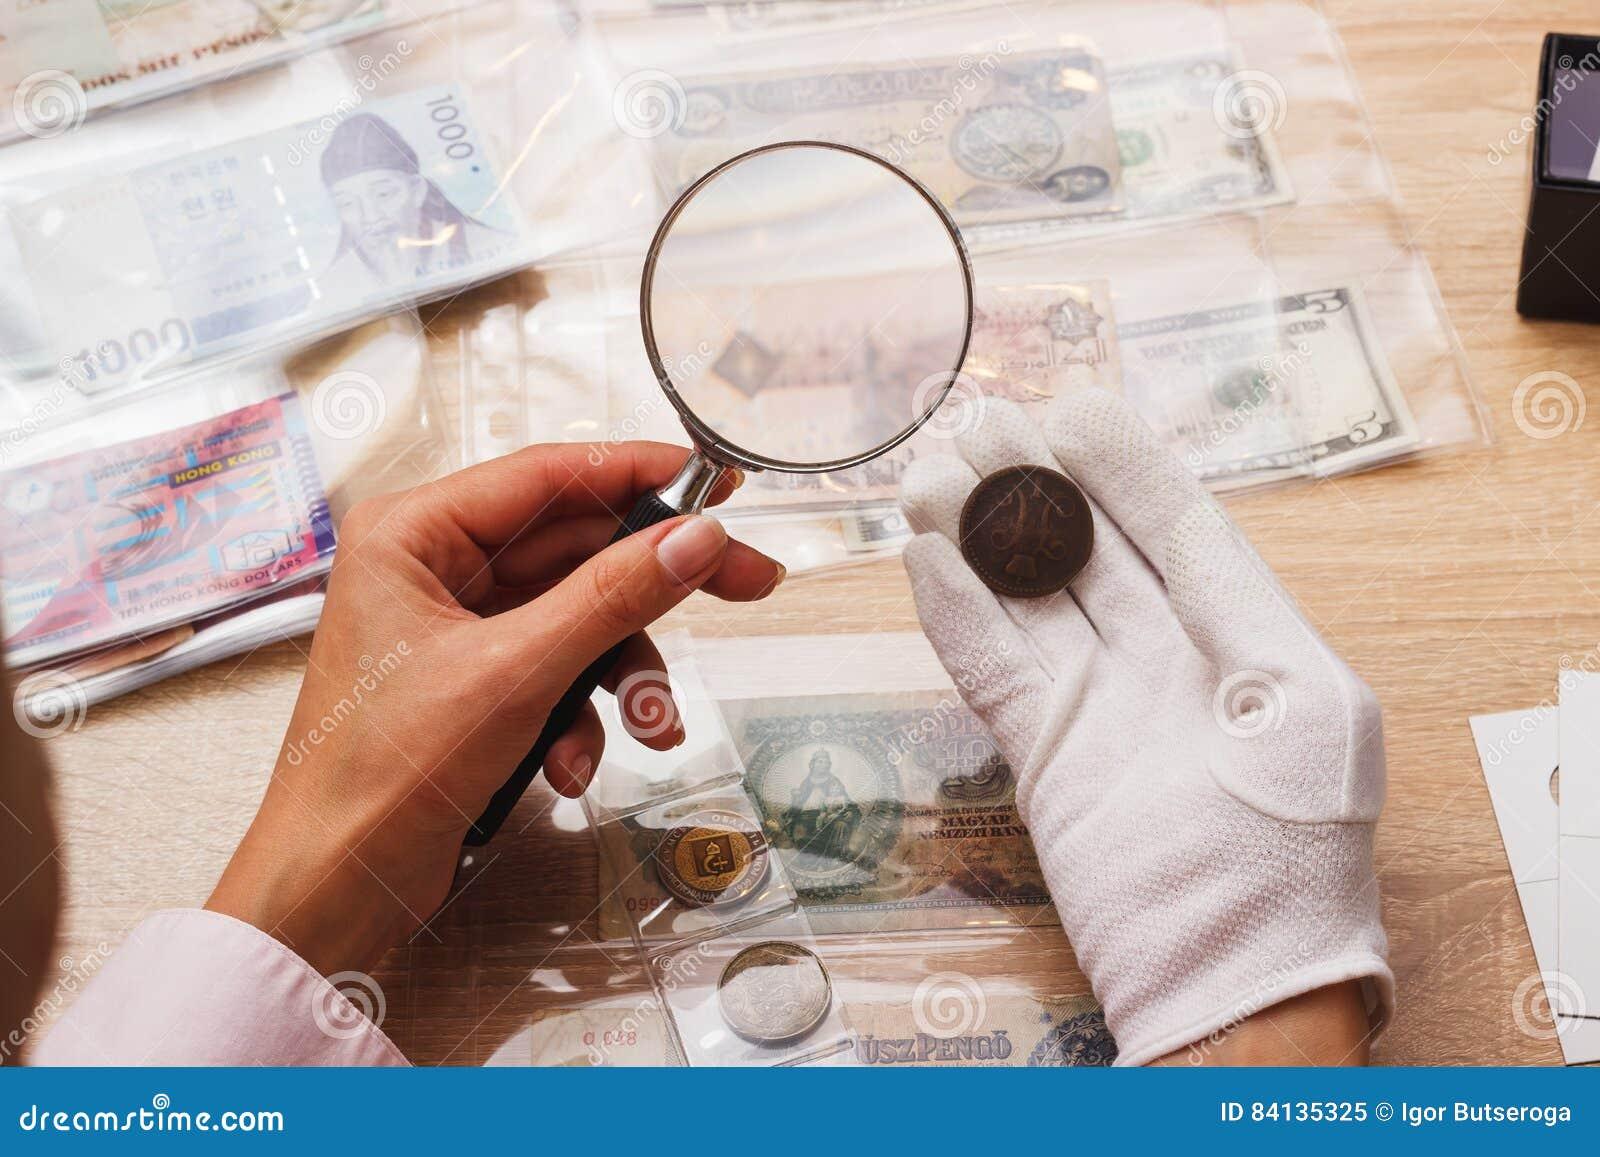 картинка лупа с монетами бесценная наживка